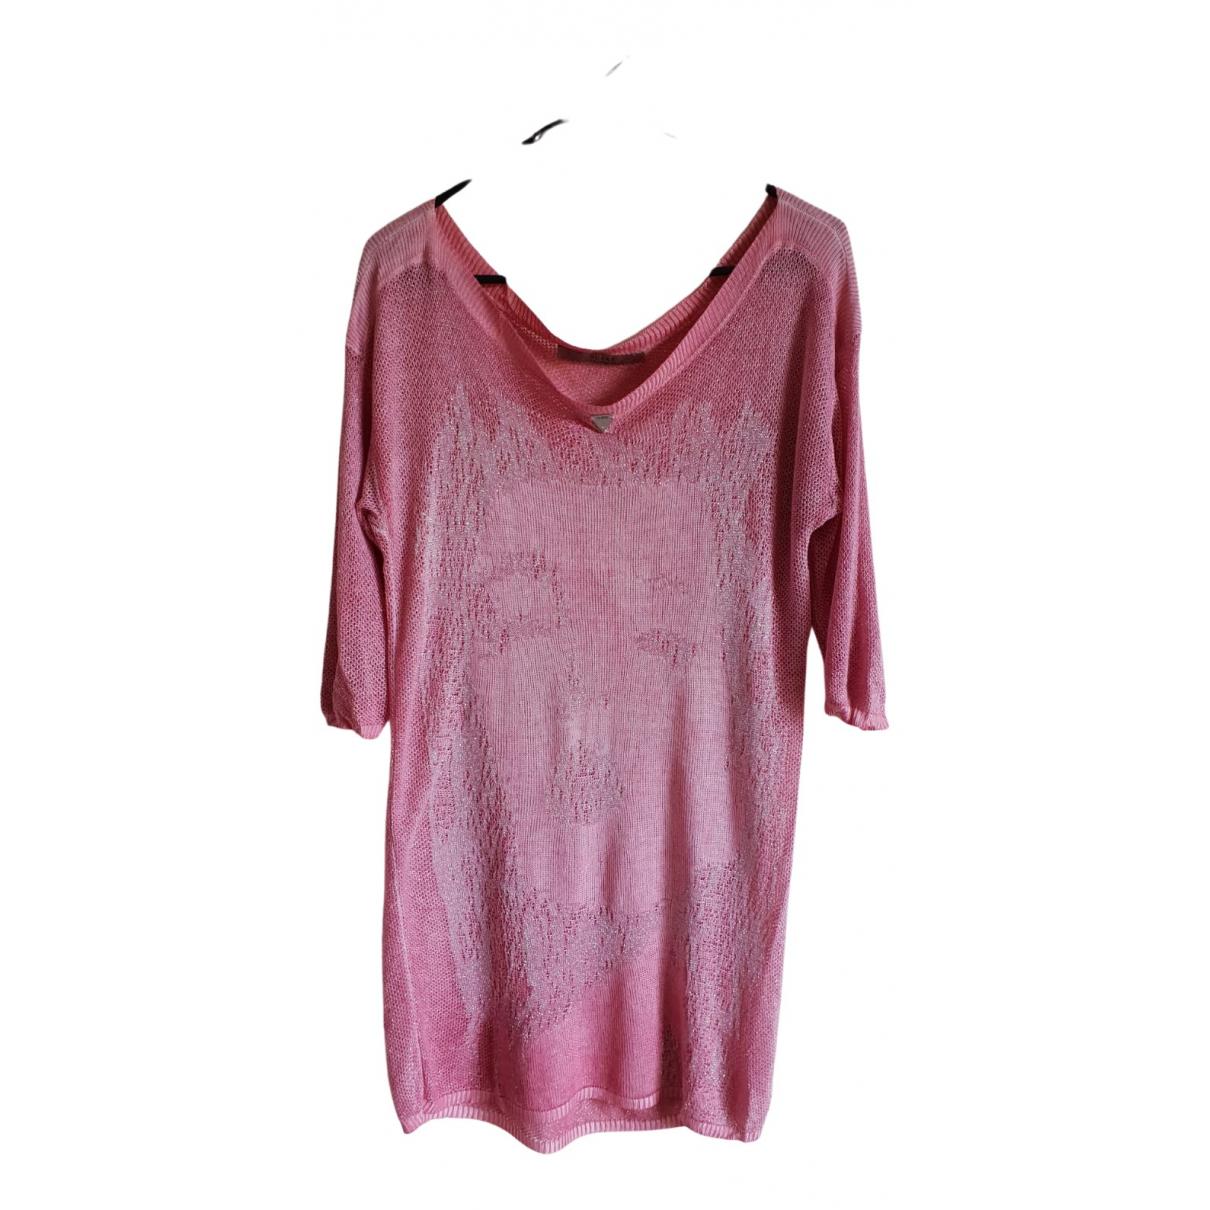 Guess \N Pink Knitwear for Women 36 FR